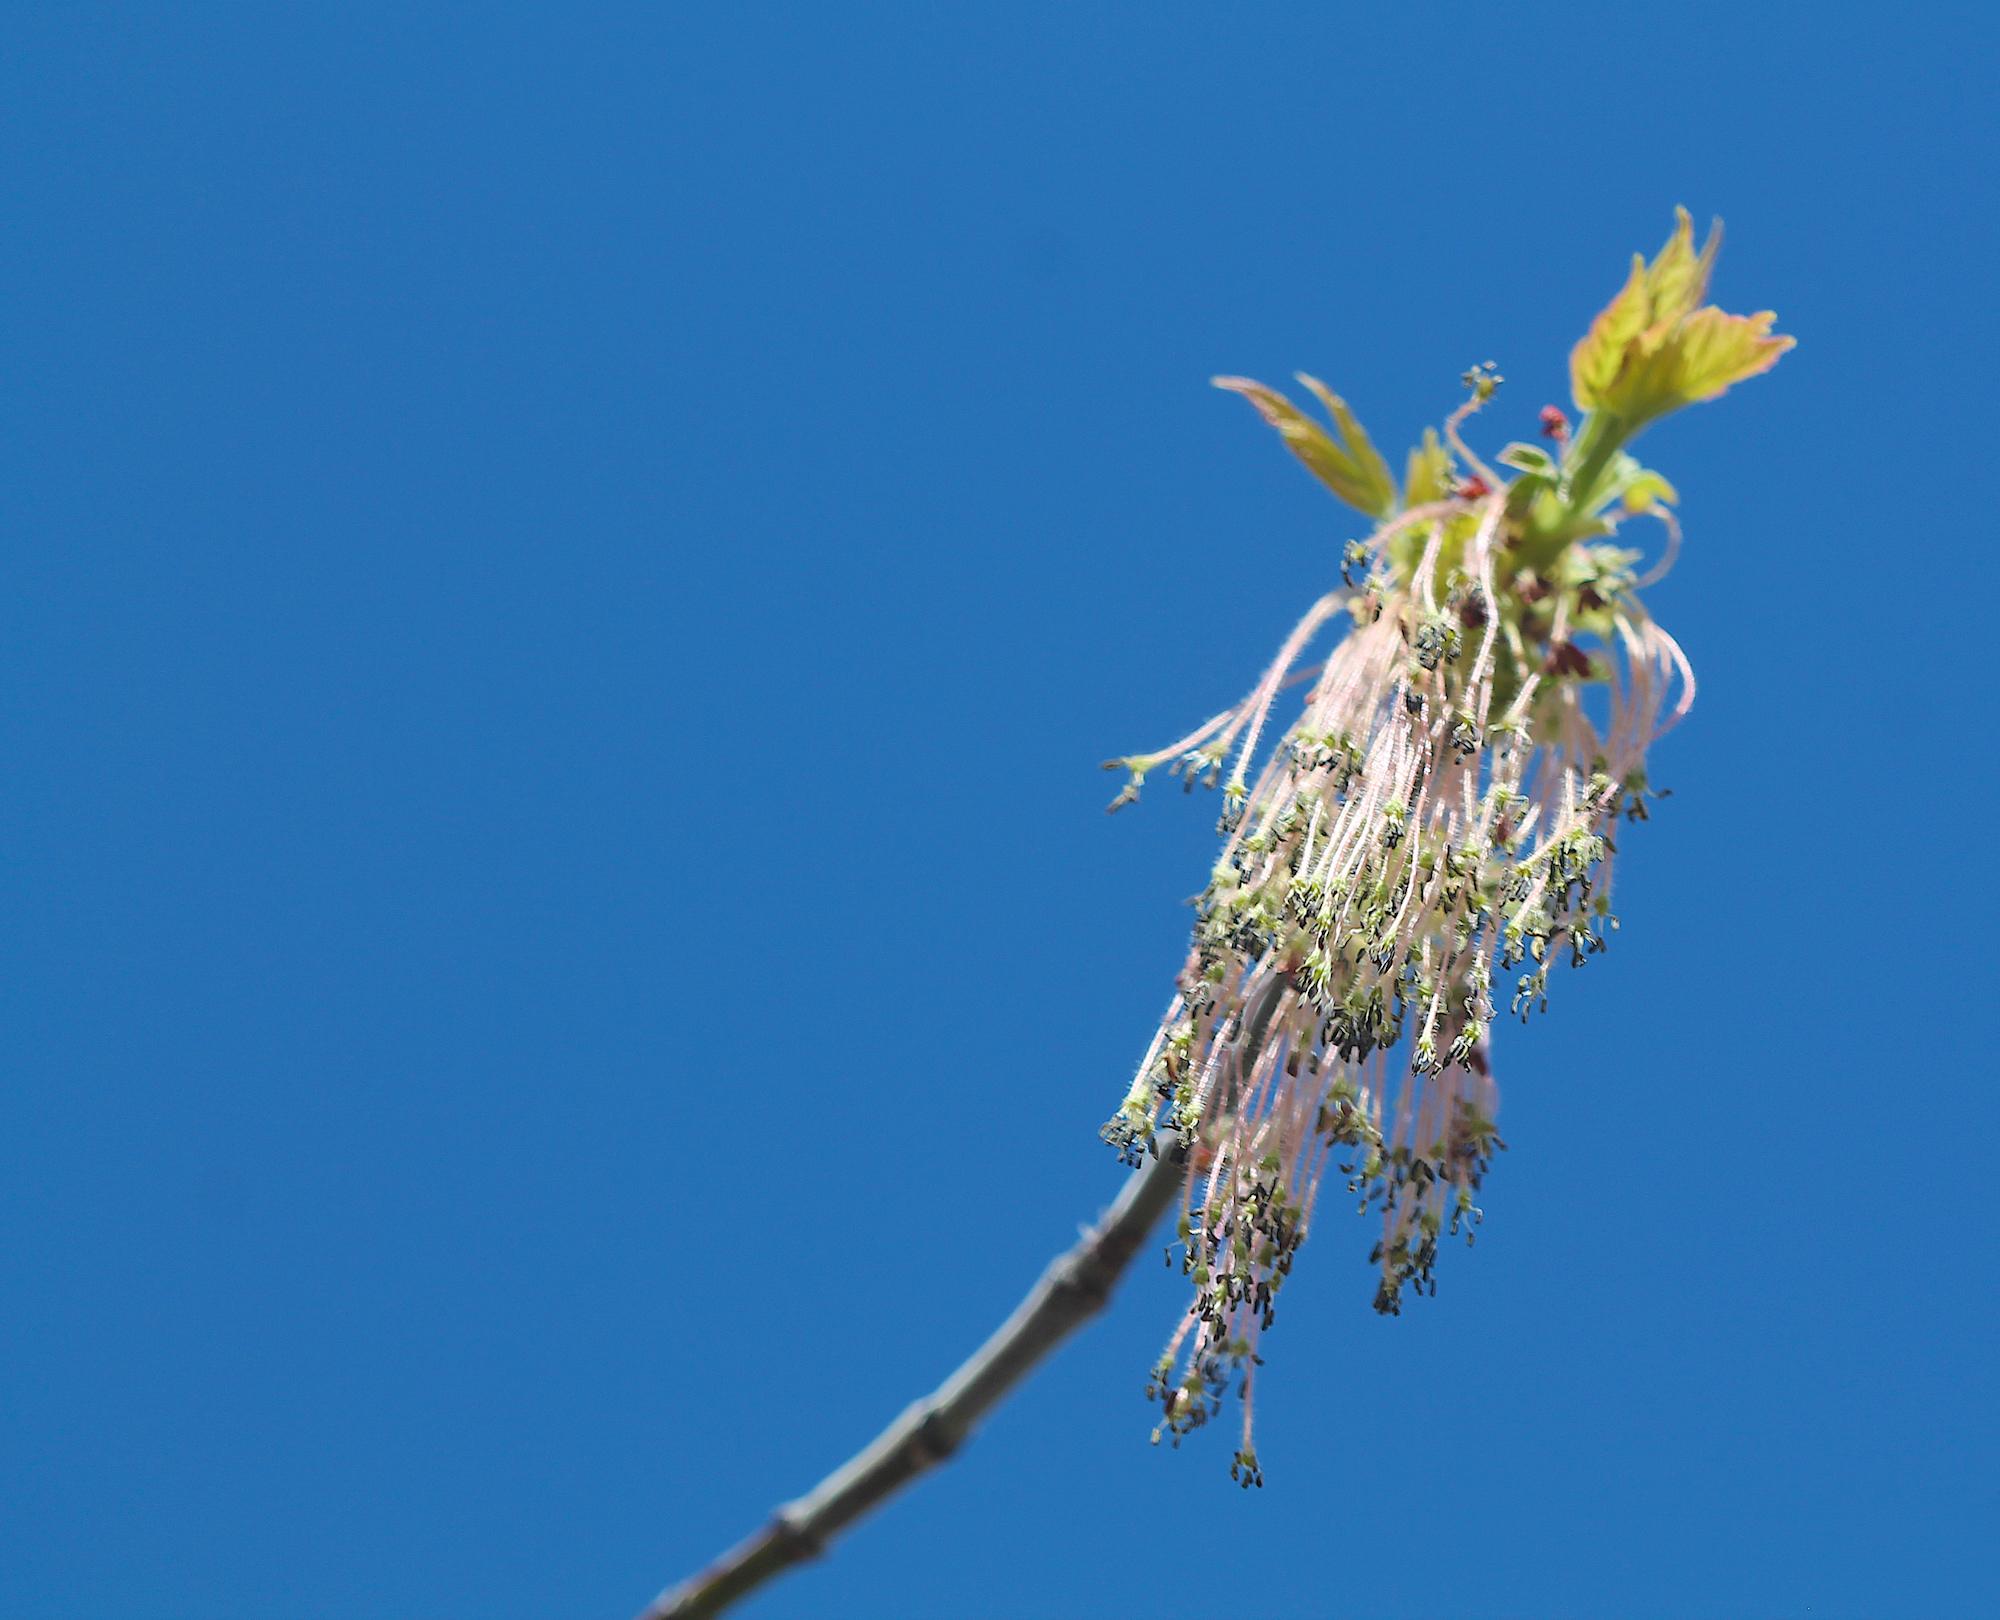 Box elder flowers.